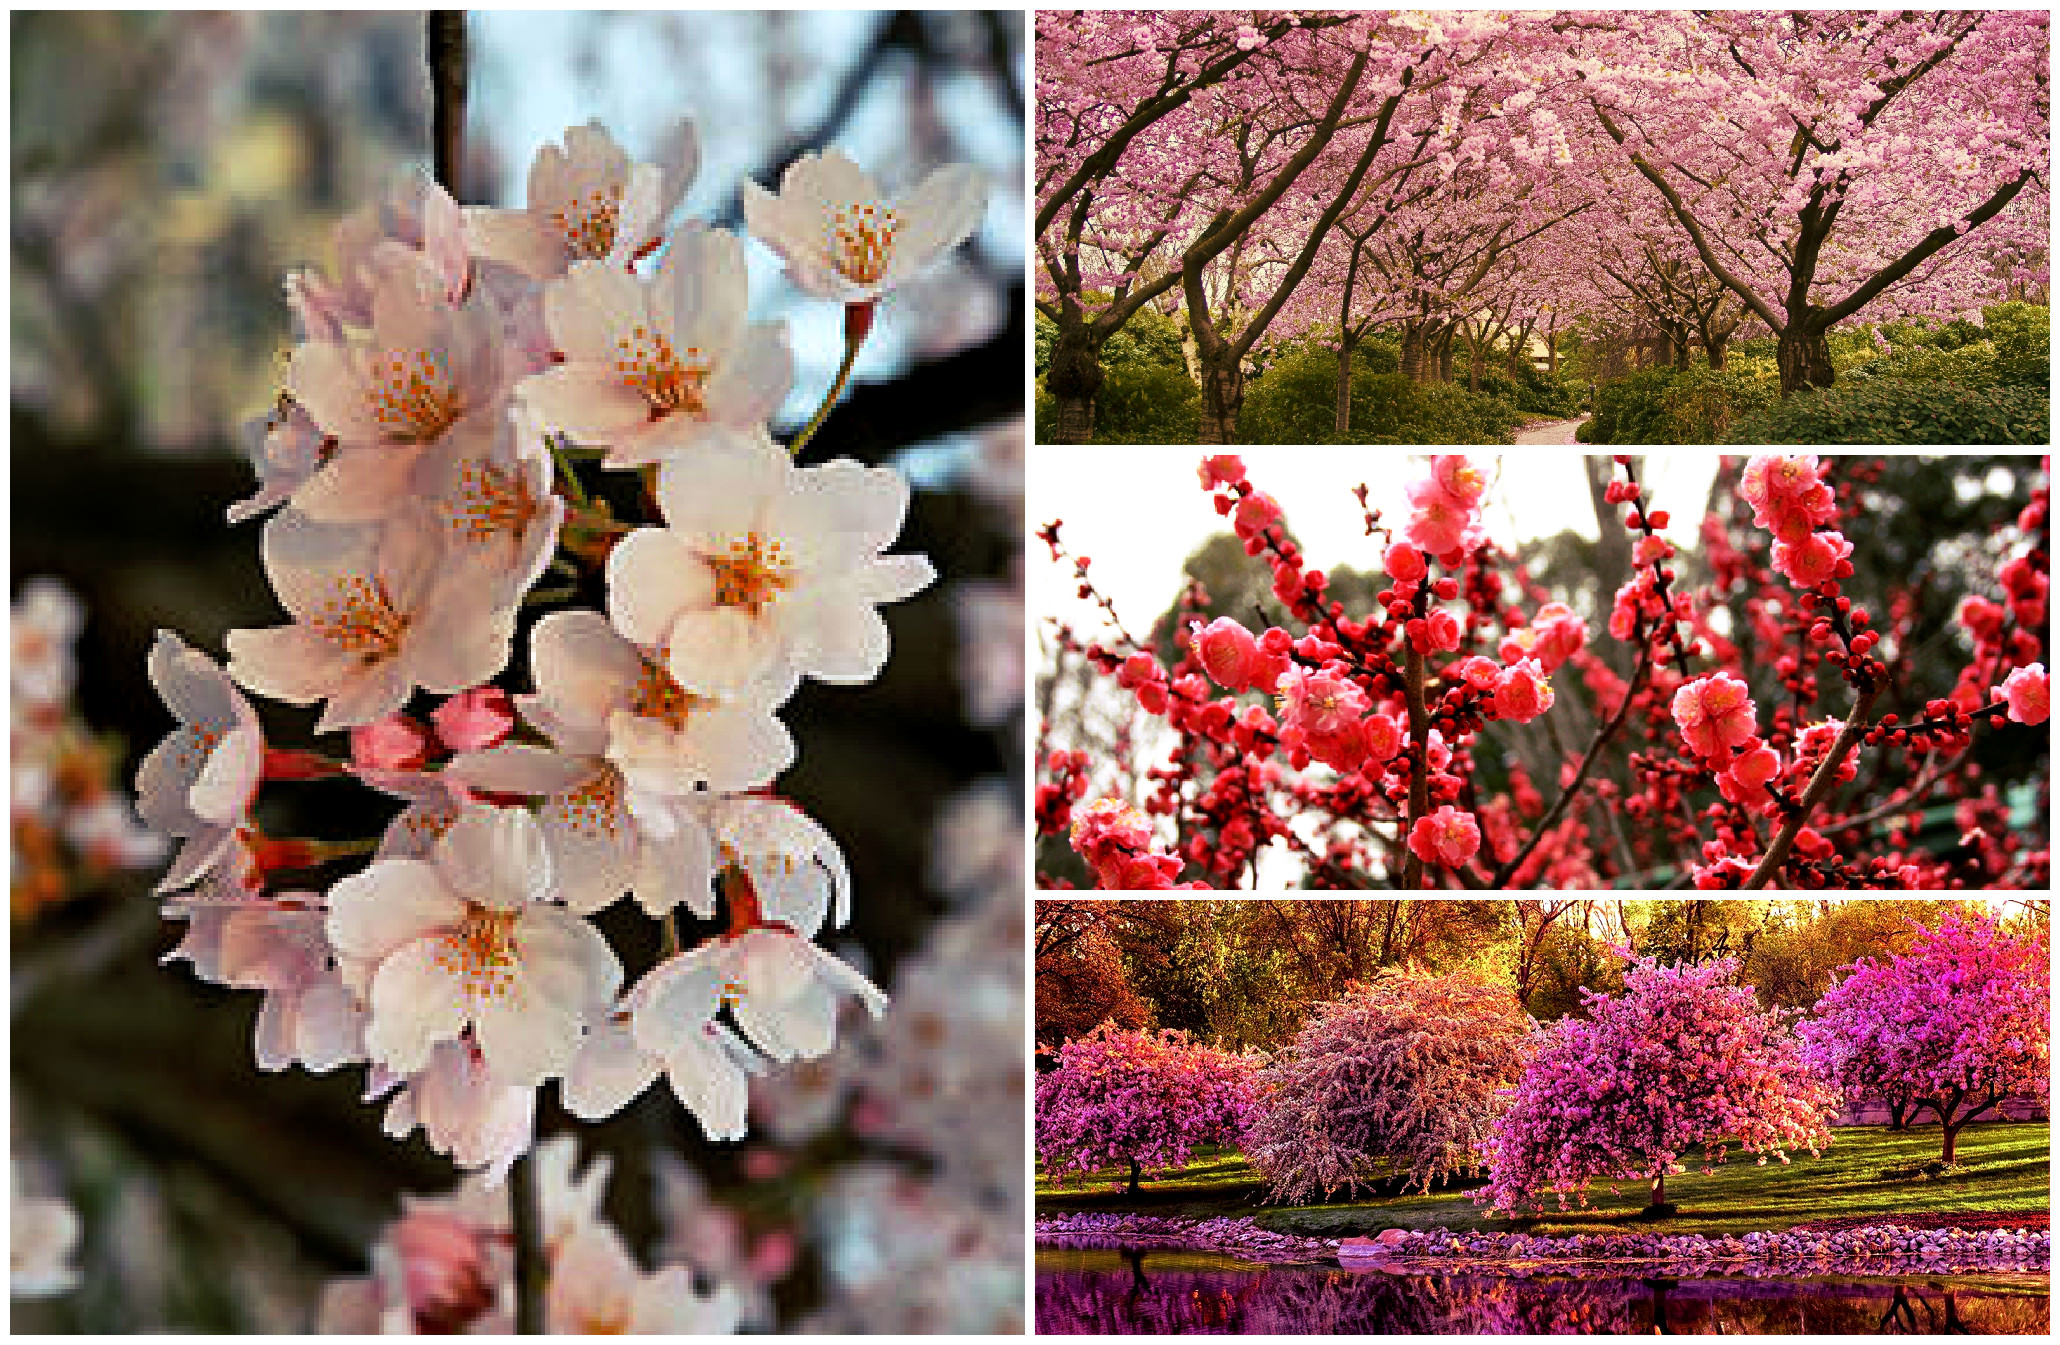 цветы мира сакура